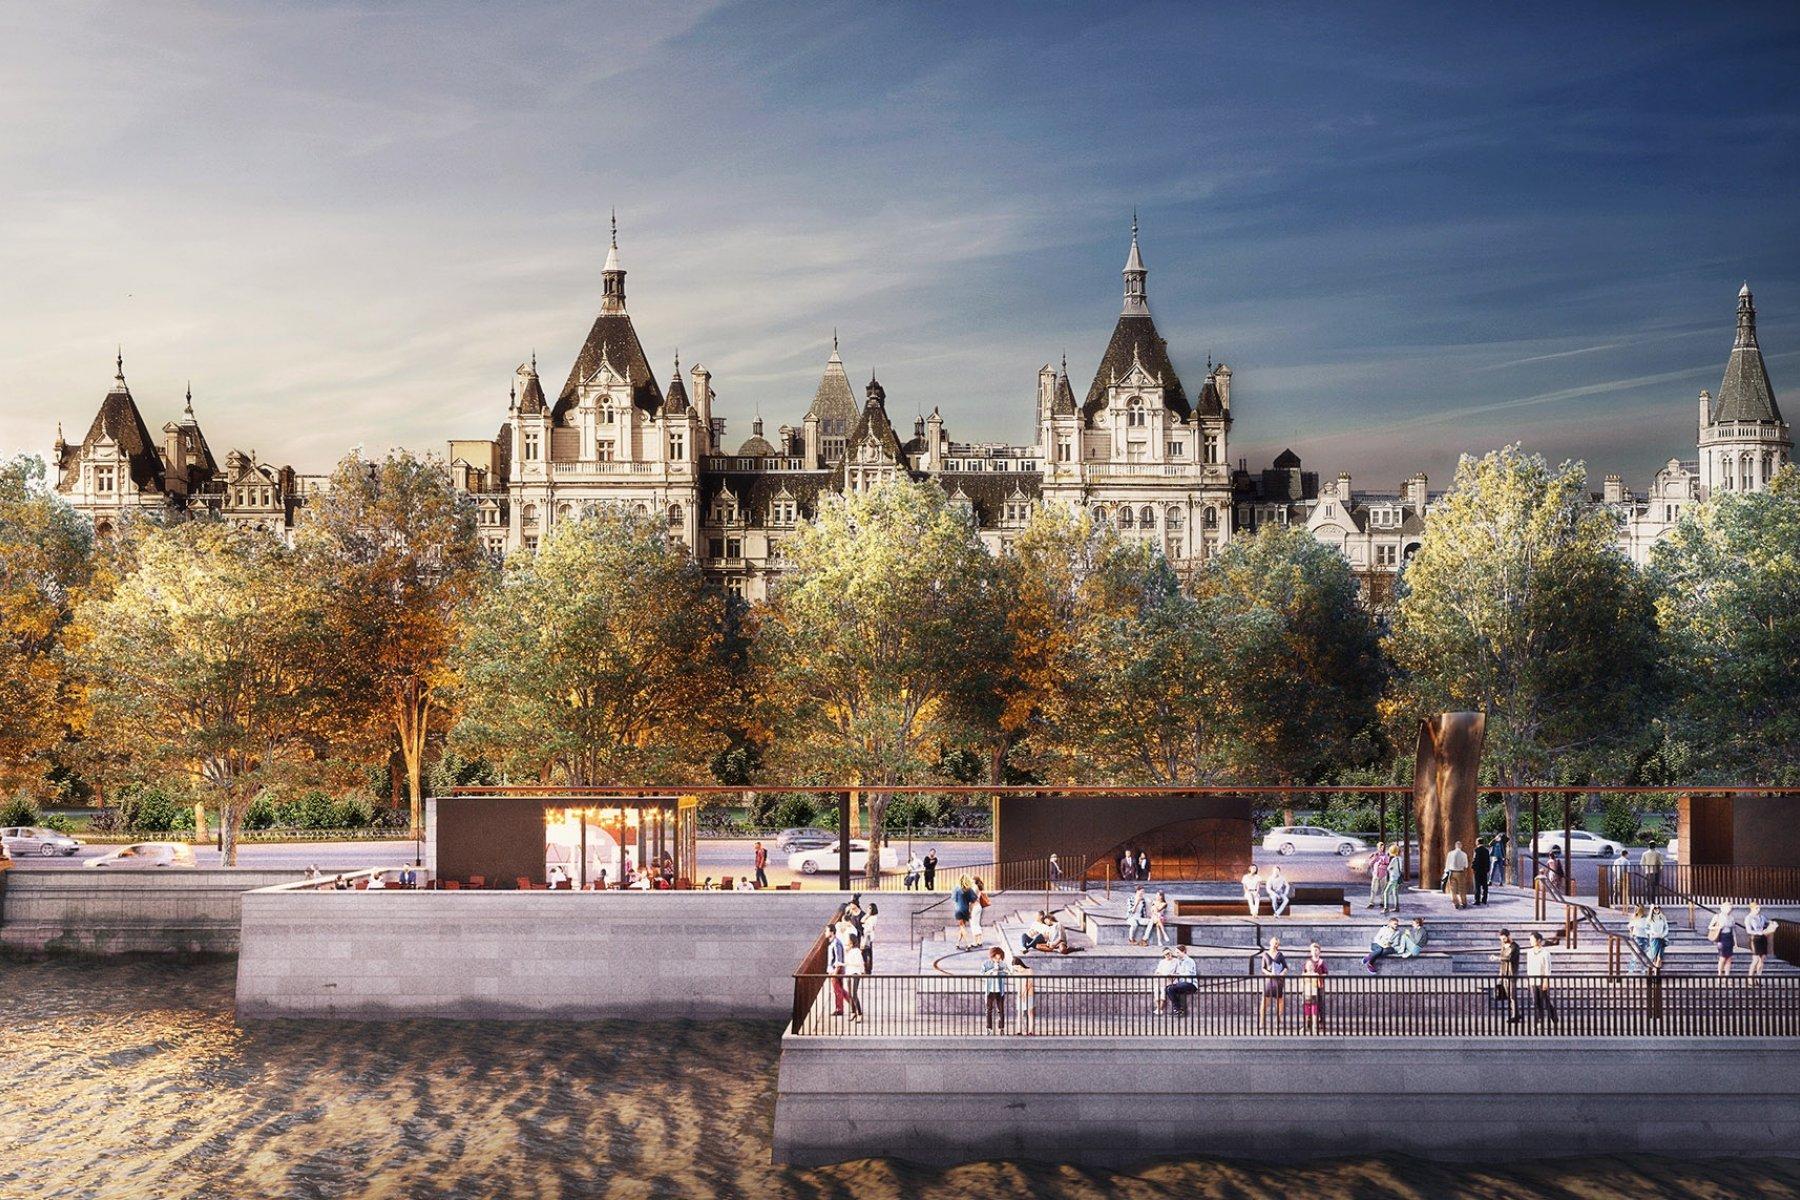 Thames Tideway Project